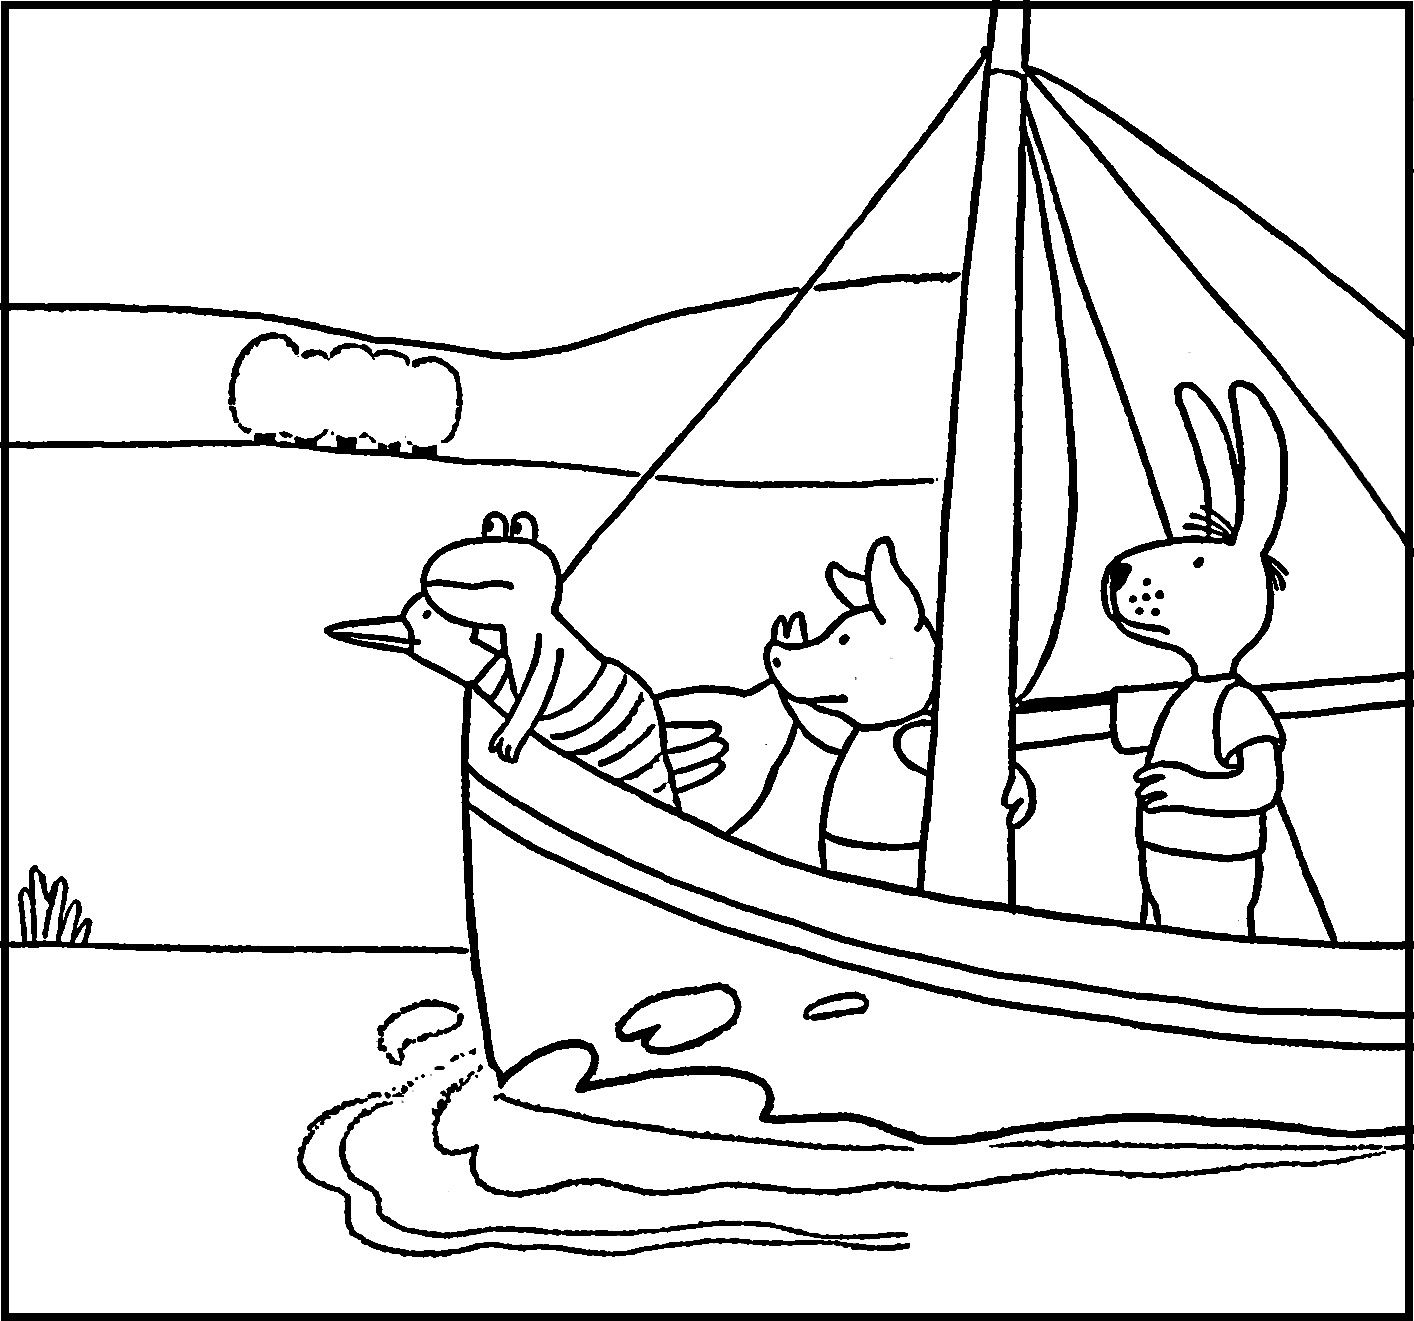 kleurplaat vervoer boot kikker max velthuijs kikker